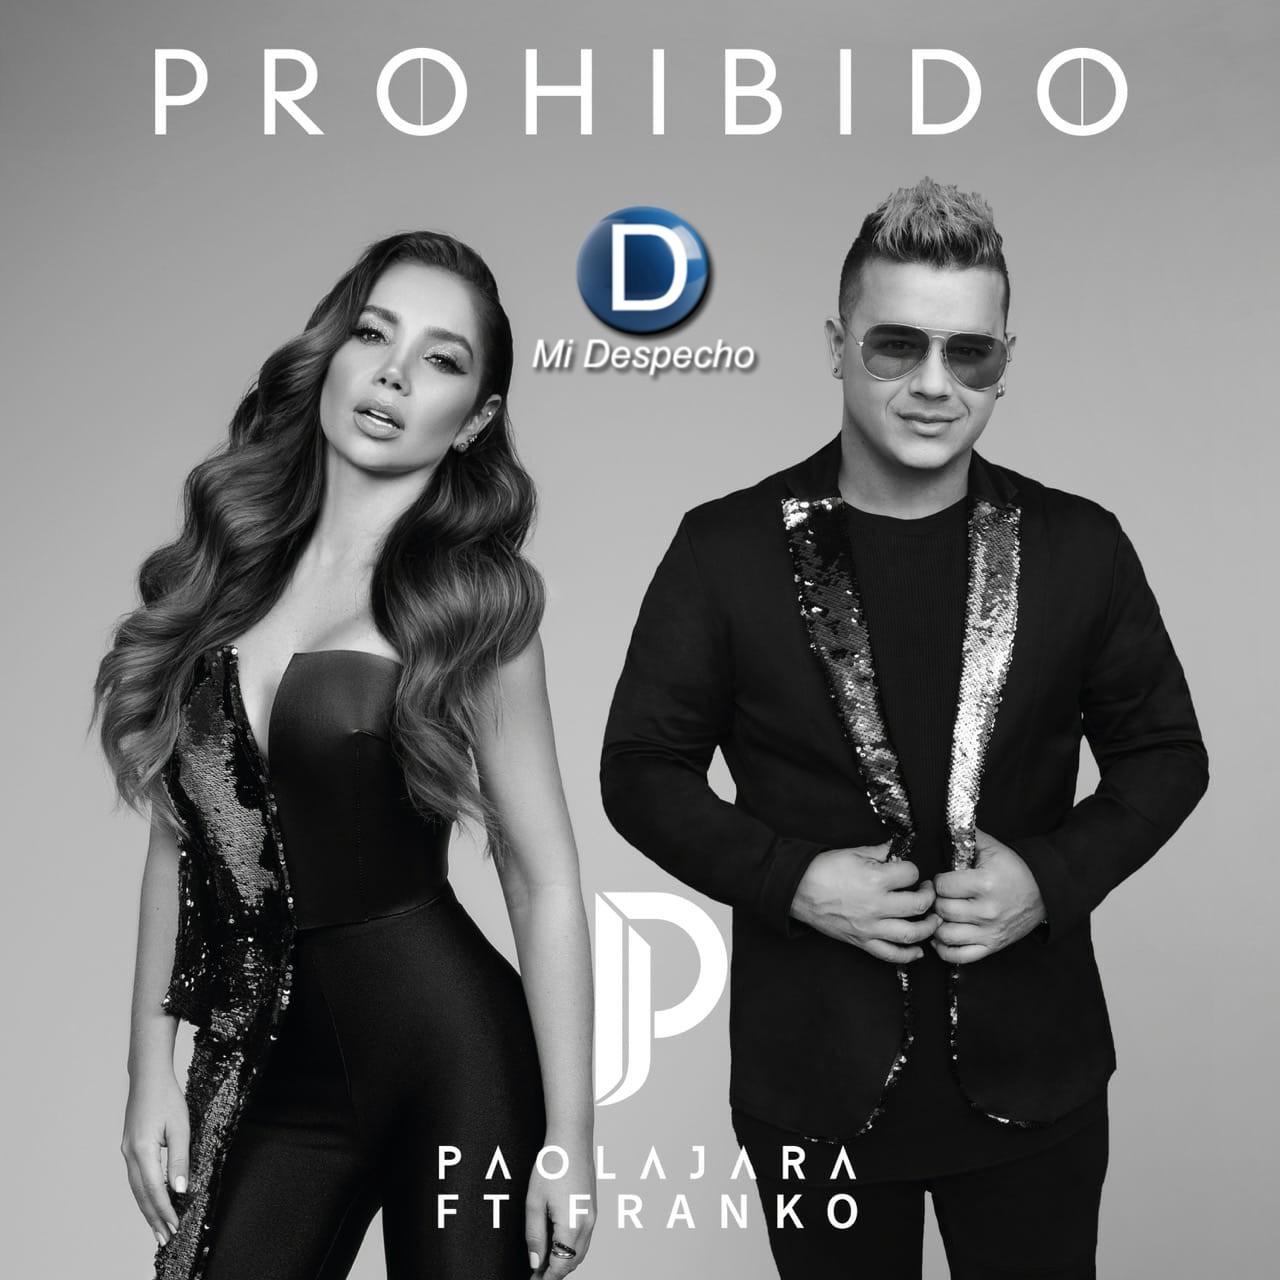 Paola Jara & Franko Prohibido Frontal